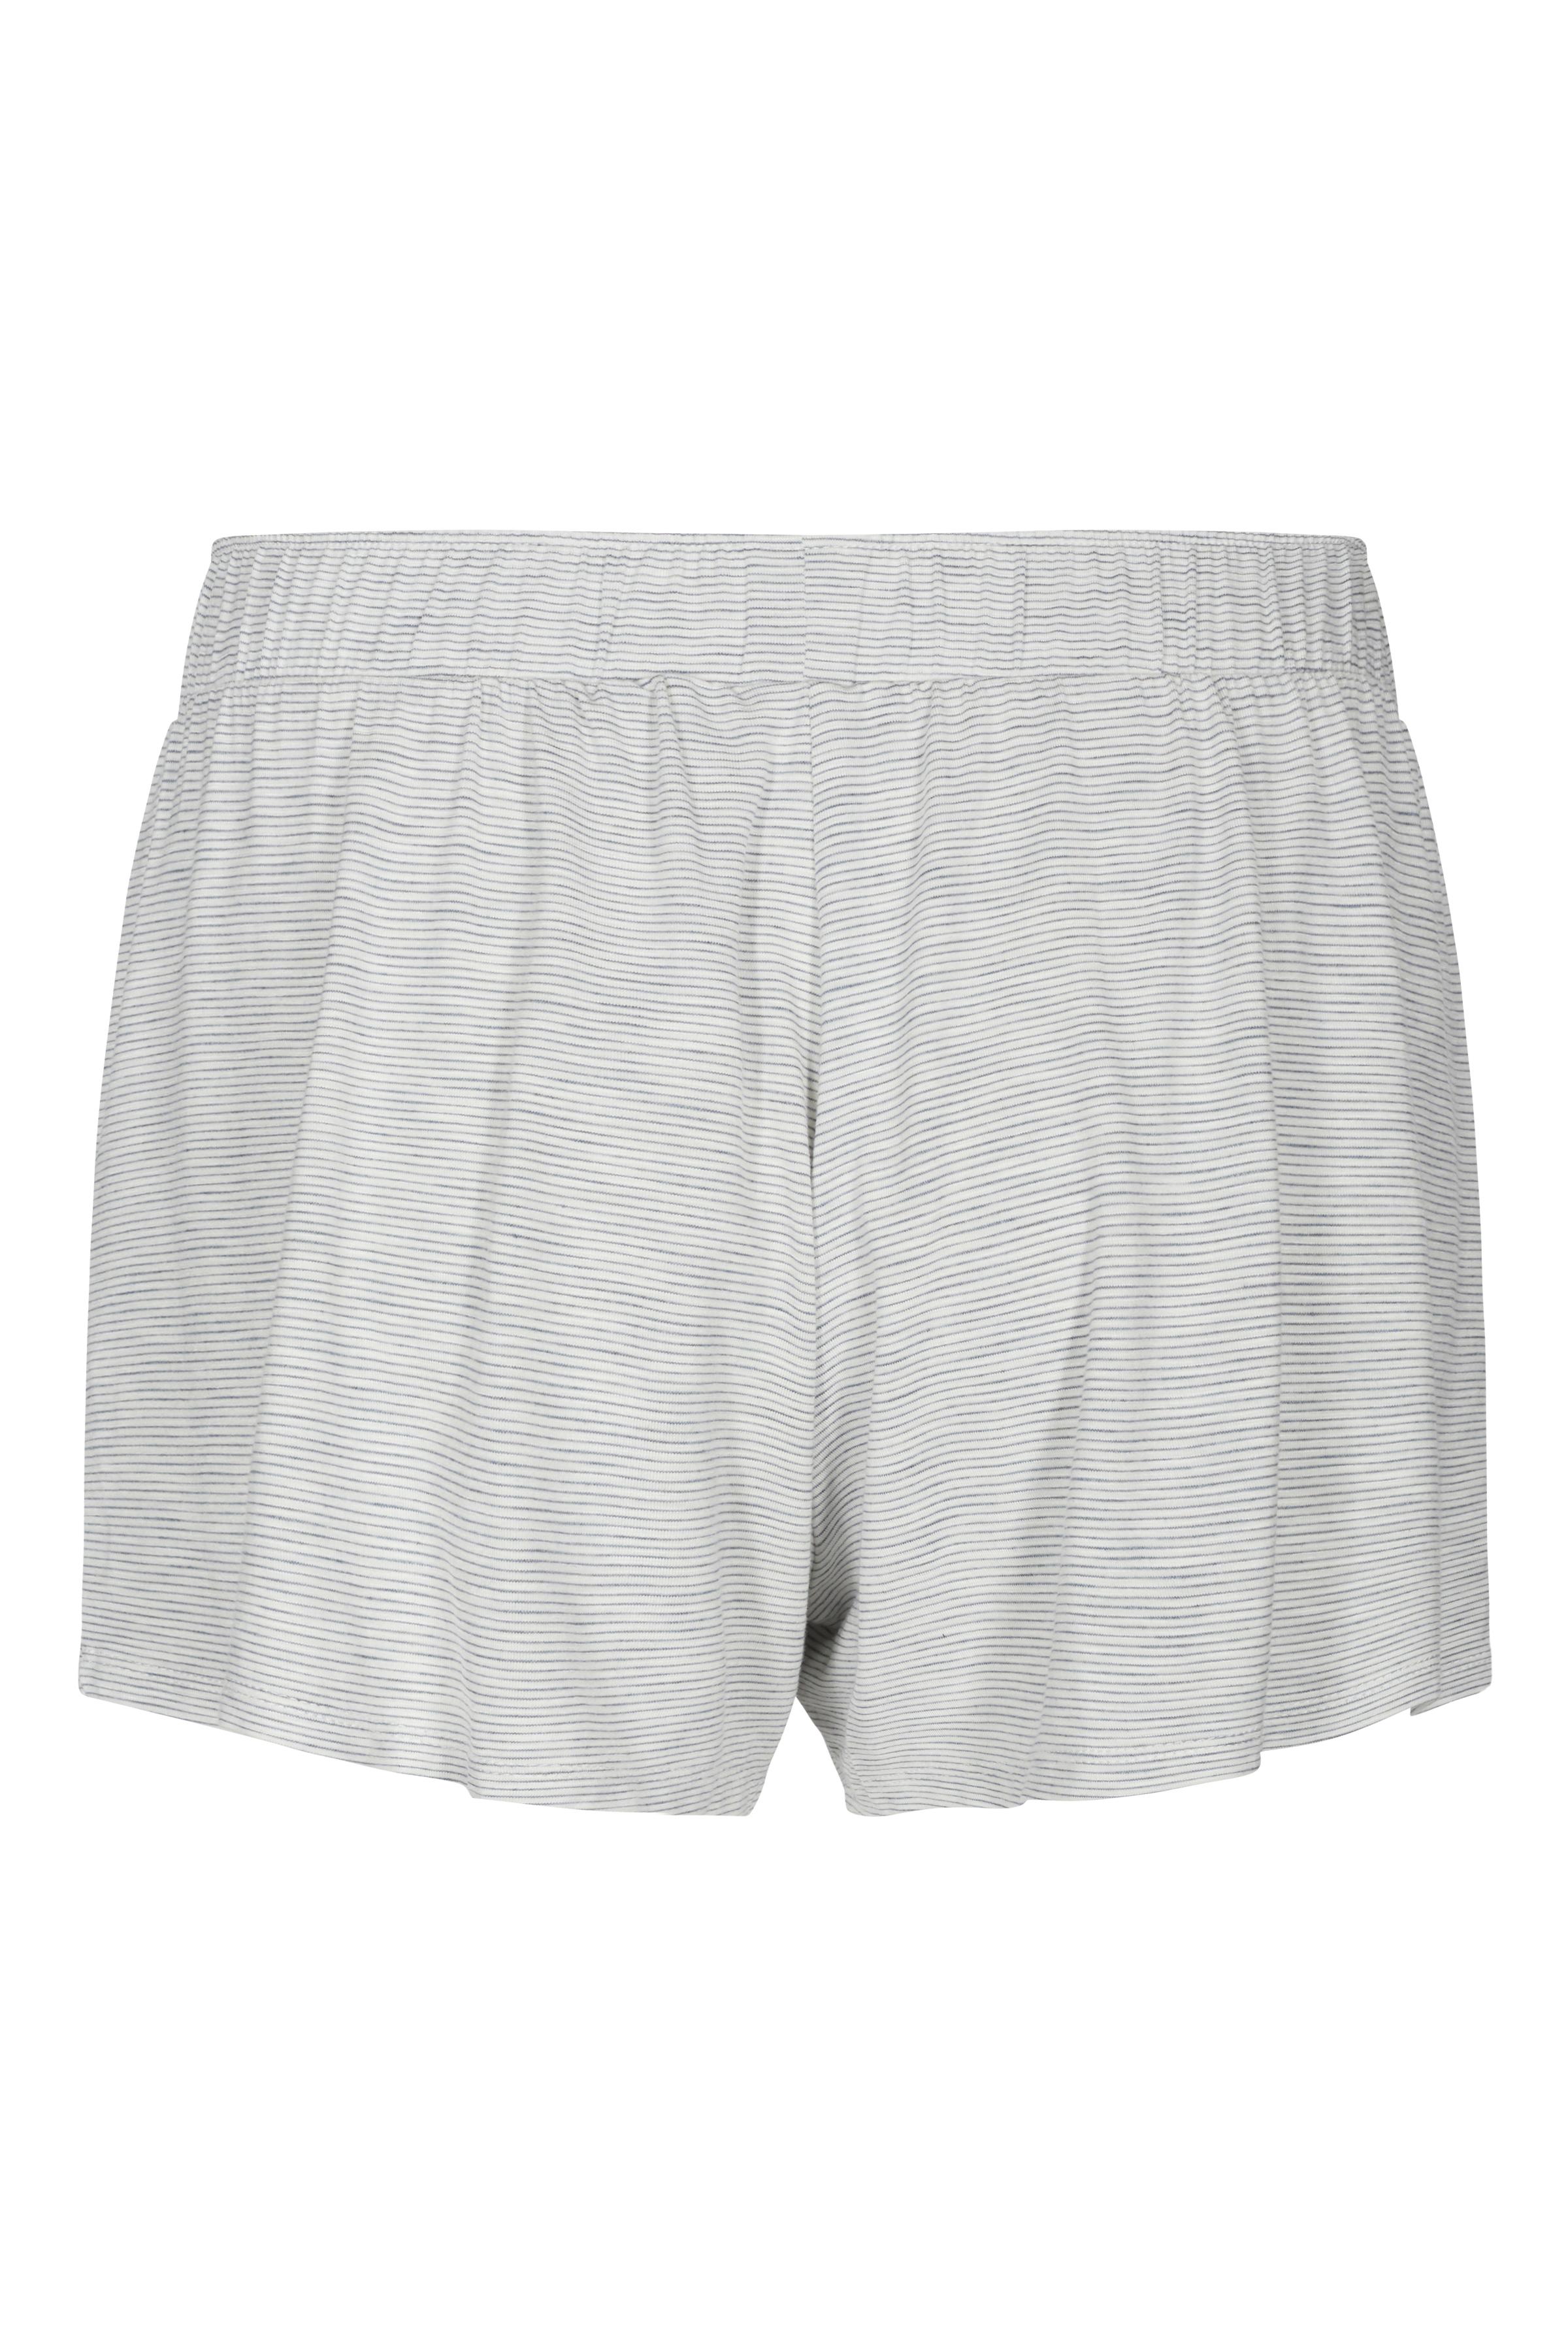 Off-white/grå Homewear set från Triumph – Köp Off-white/grå Homewear set från stl. 38-48 här